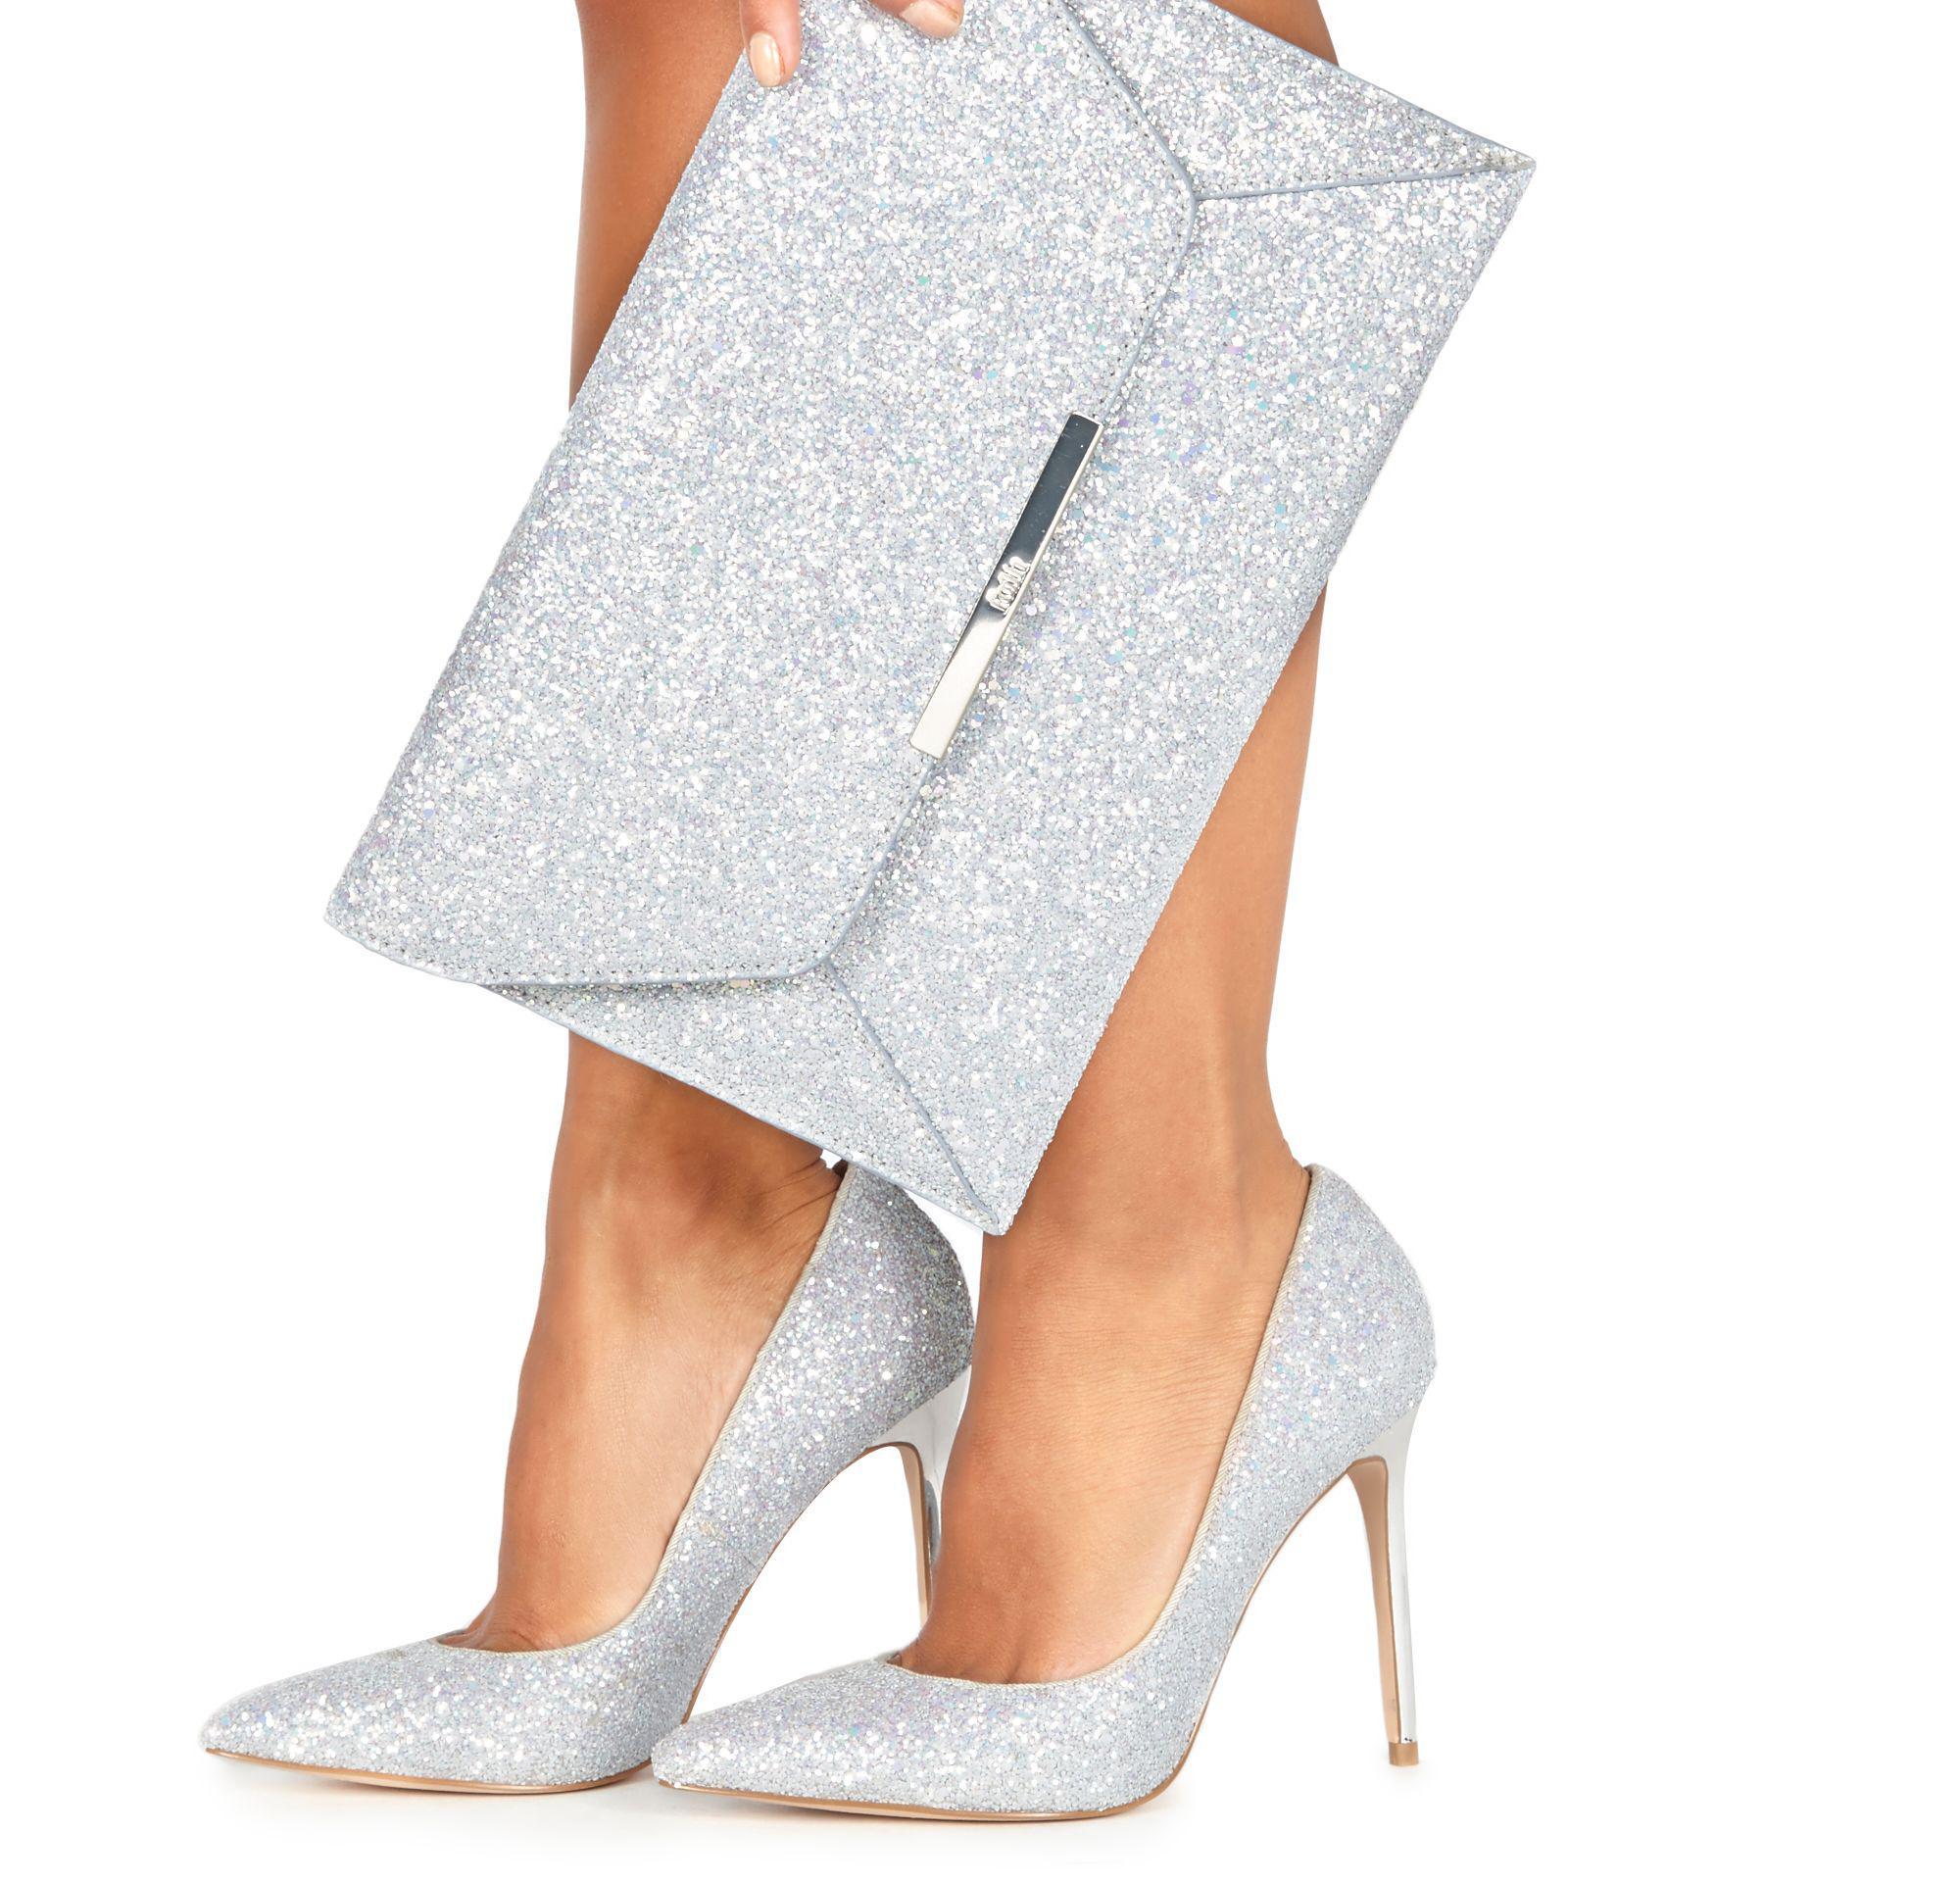 18dd2ab8f97 Faith Silver Glitter  chloe Party  High Stiletto Heel Pointed Shoes ...